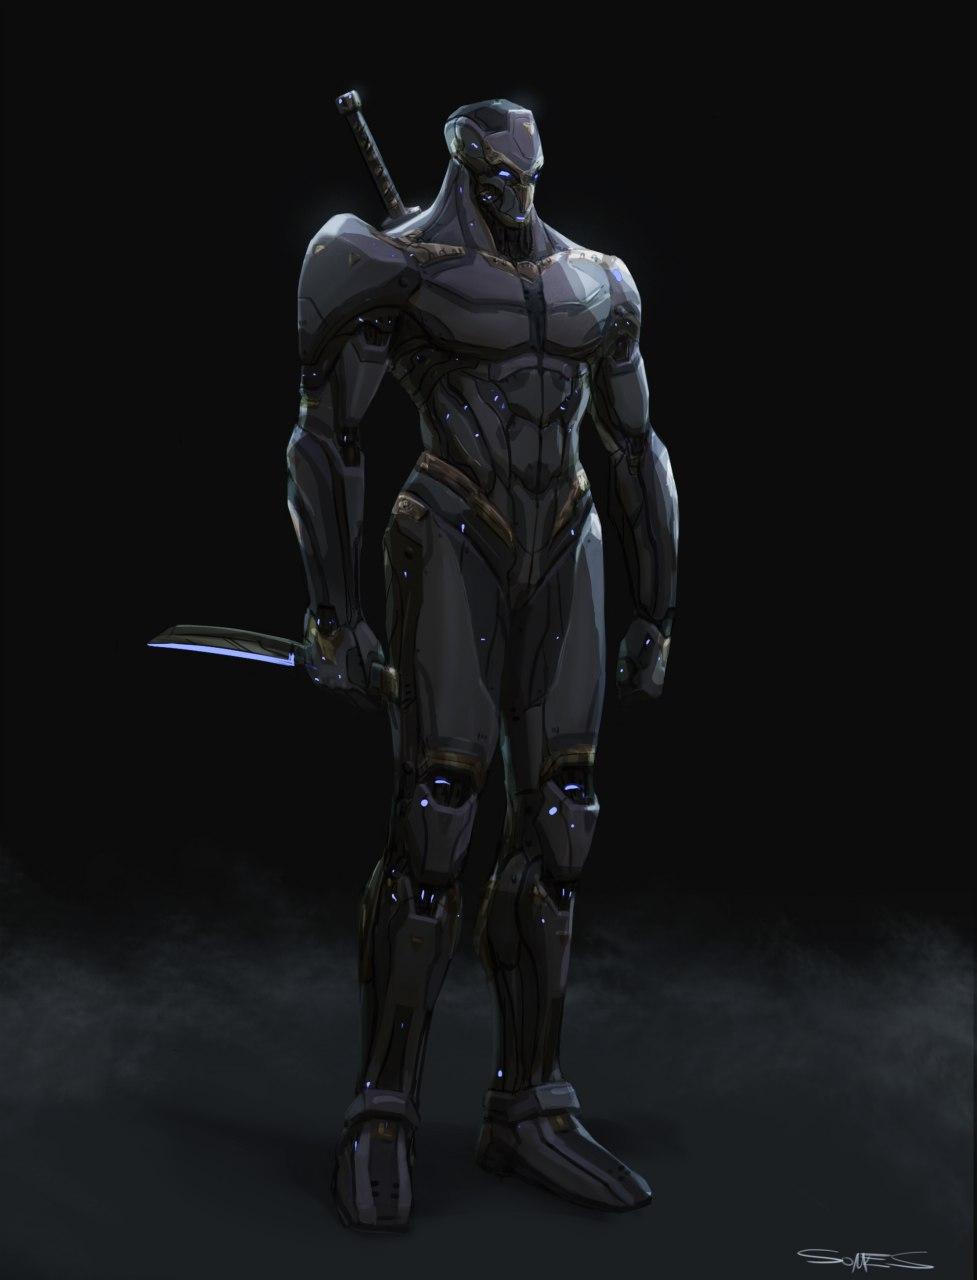 Concept Art - Cyborg Ninja